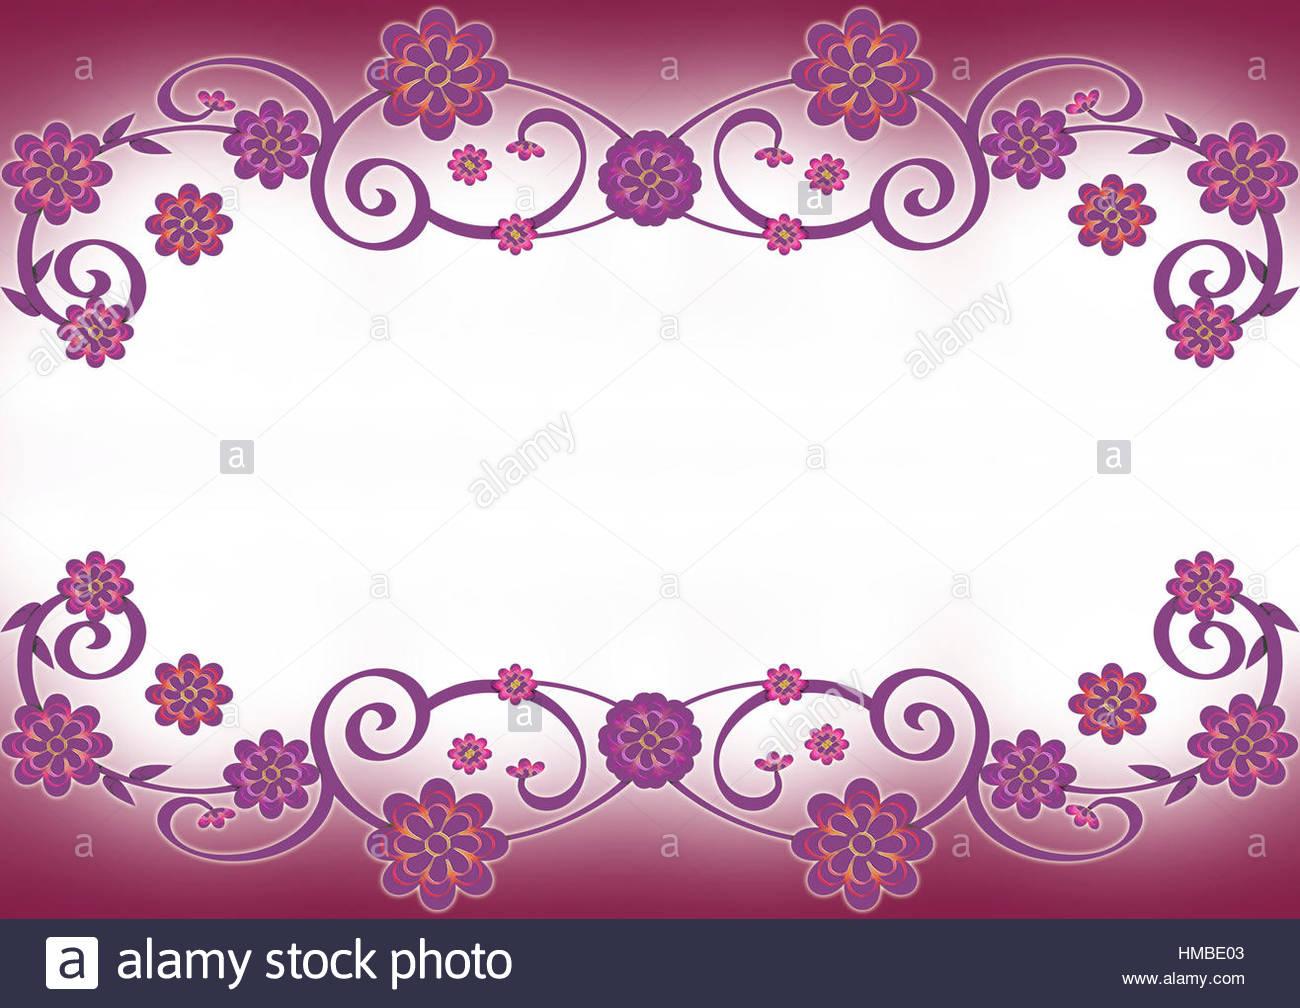 burgundy and white background